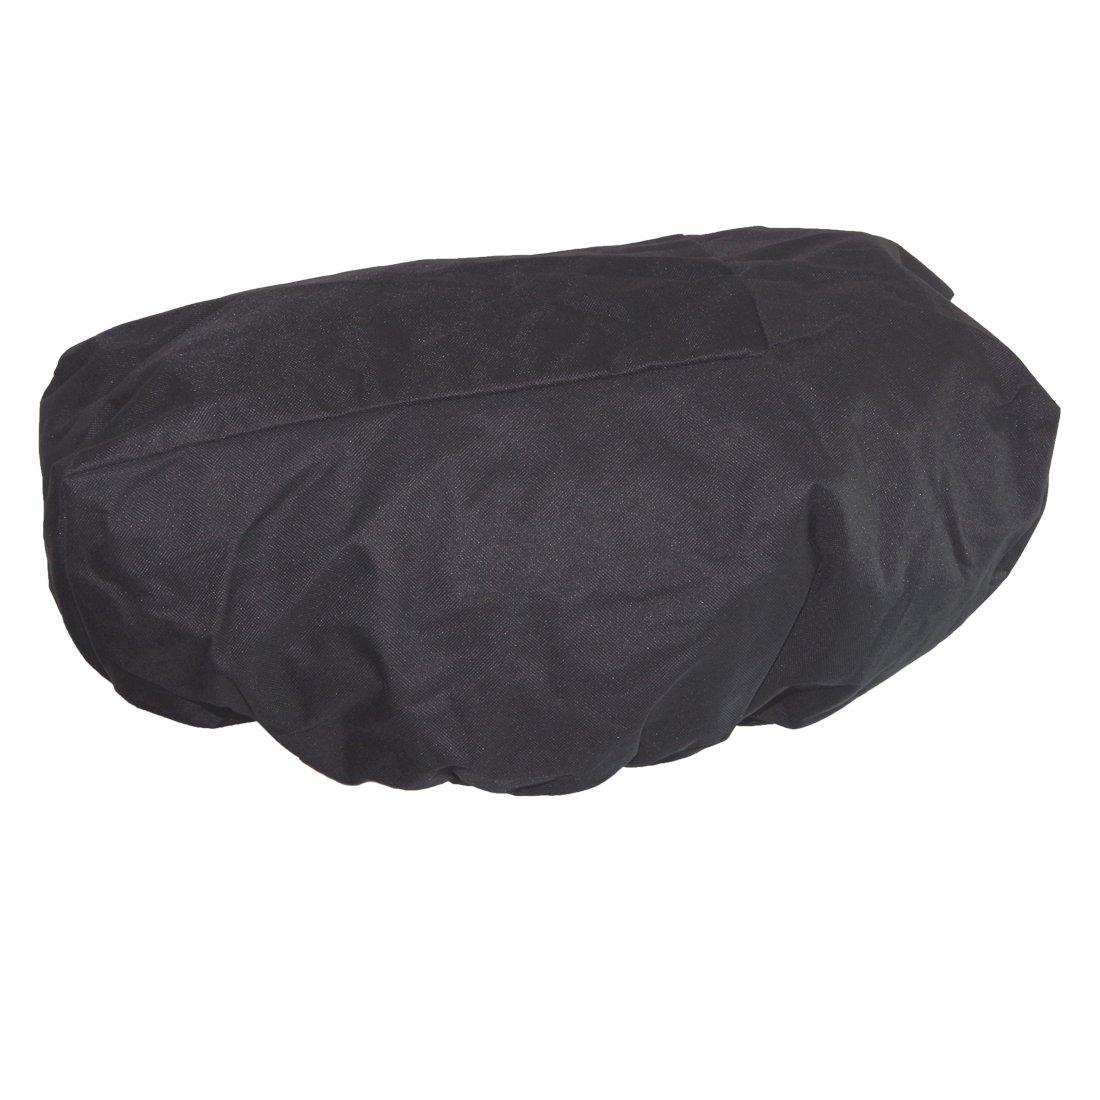 Homolo Waterproof Polyester Durable Winch Dust Cover Black Shenzhen Bermu International Trading Co Ltd